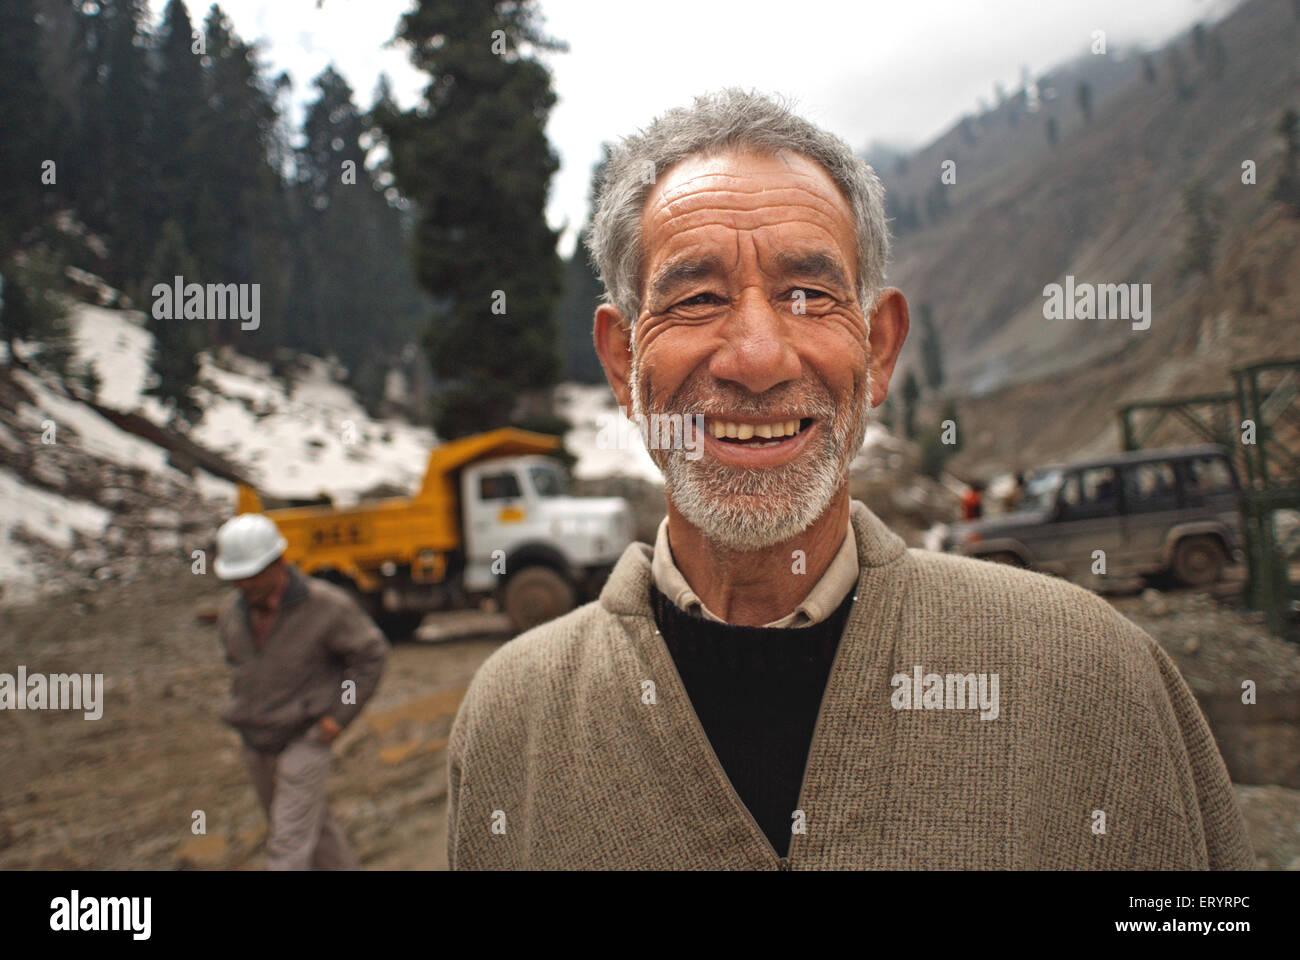 Wrinkle on face of kashmiri man ; Jammu and Kashmir ; India NO MR 8 April 2008 - Stock Image